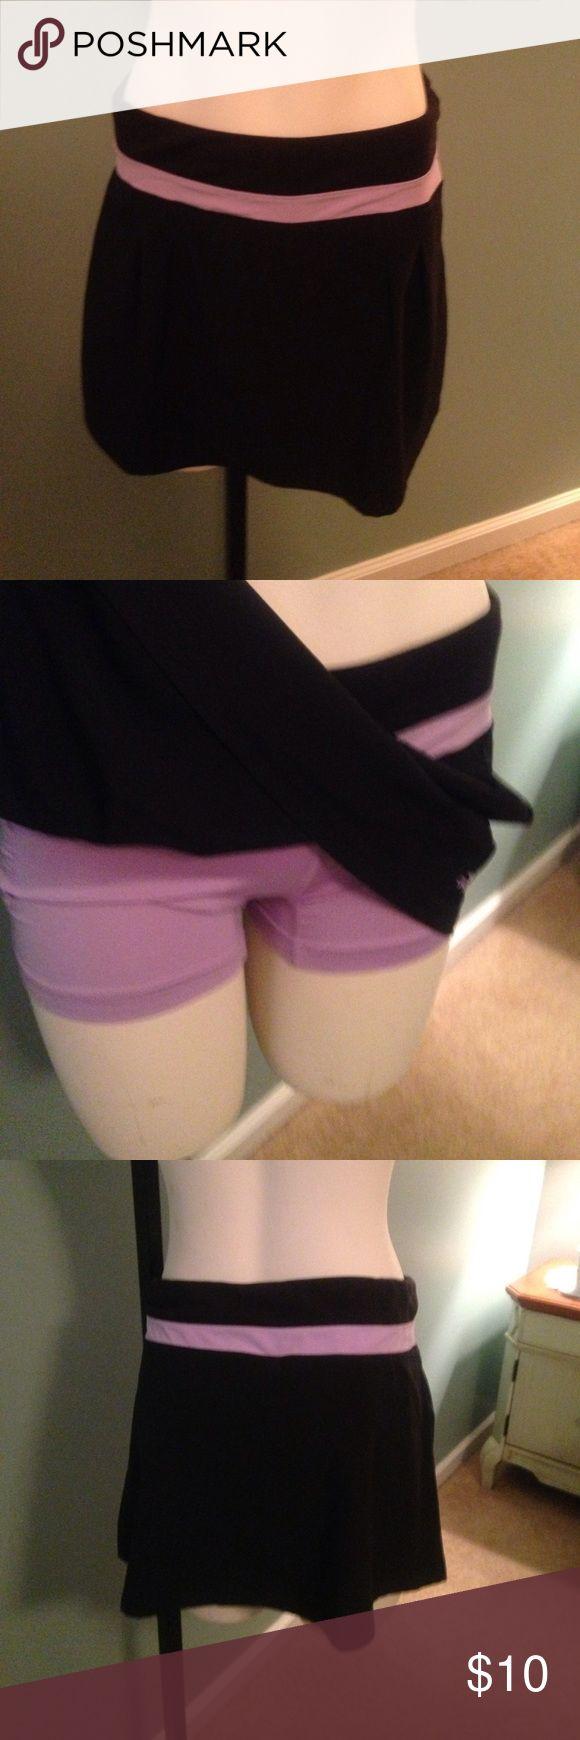 Small Adidas tennis shorts Like new condition Adidas Clima-lite black with lavender tennis shorts. adidas Shorts